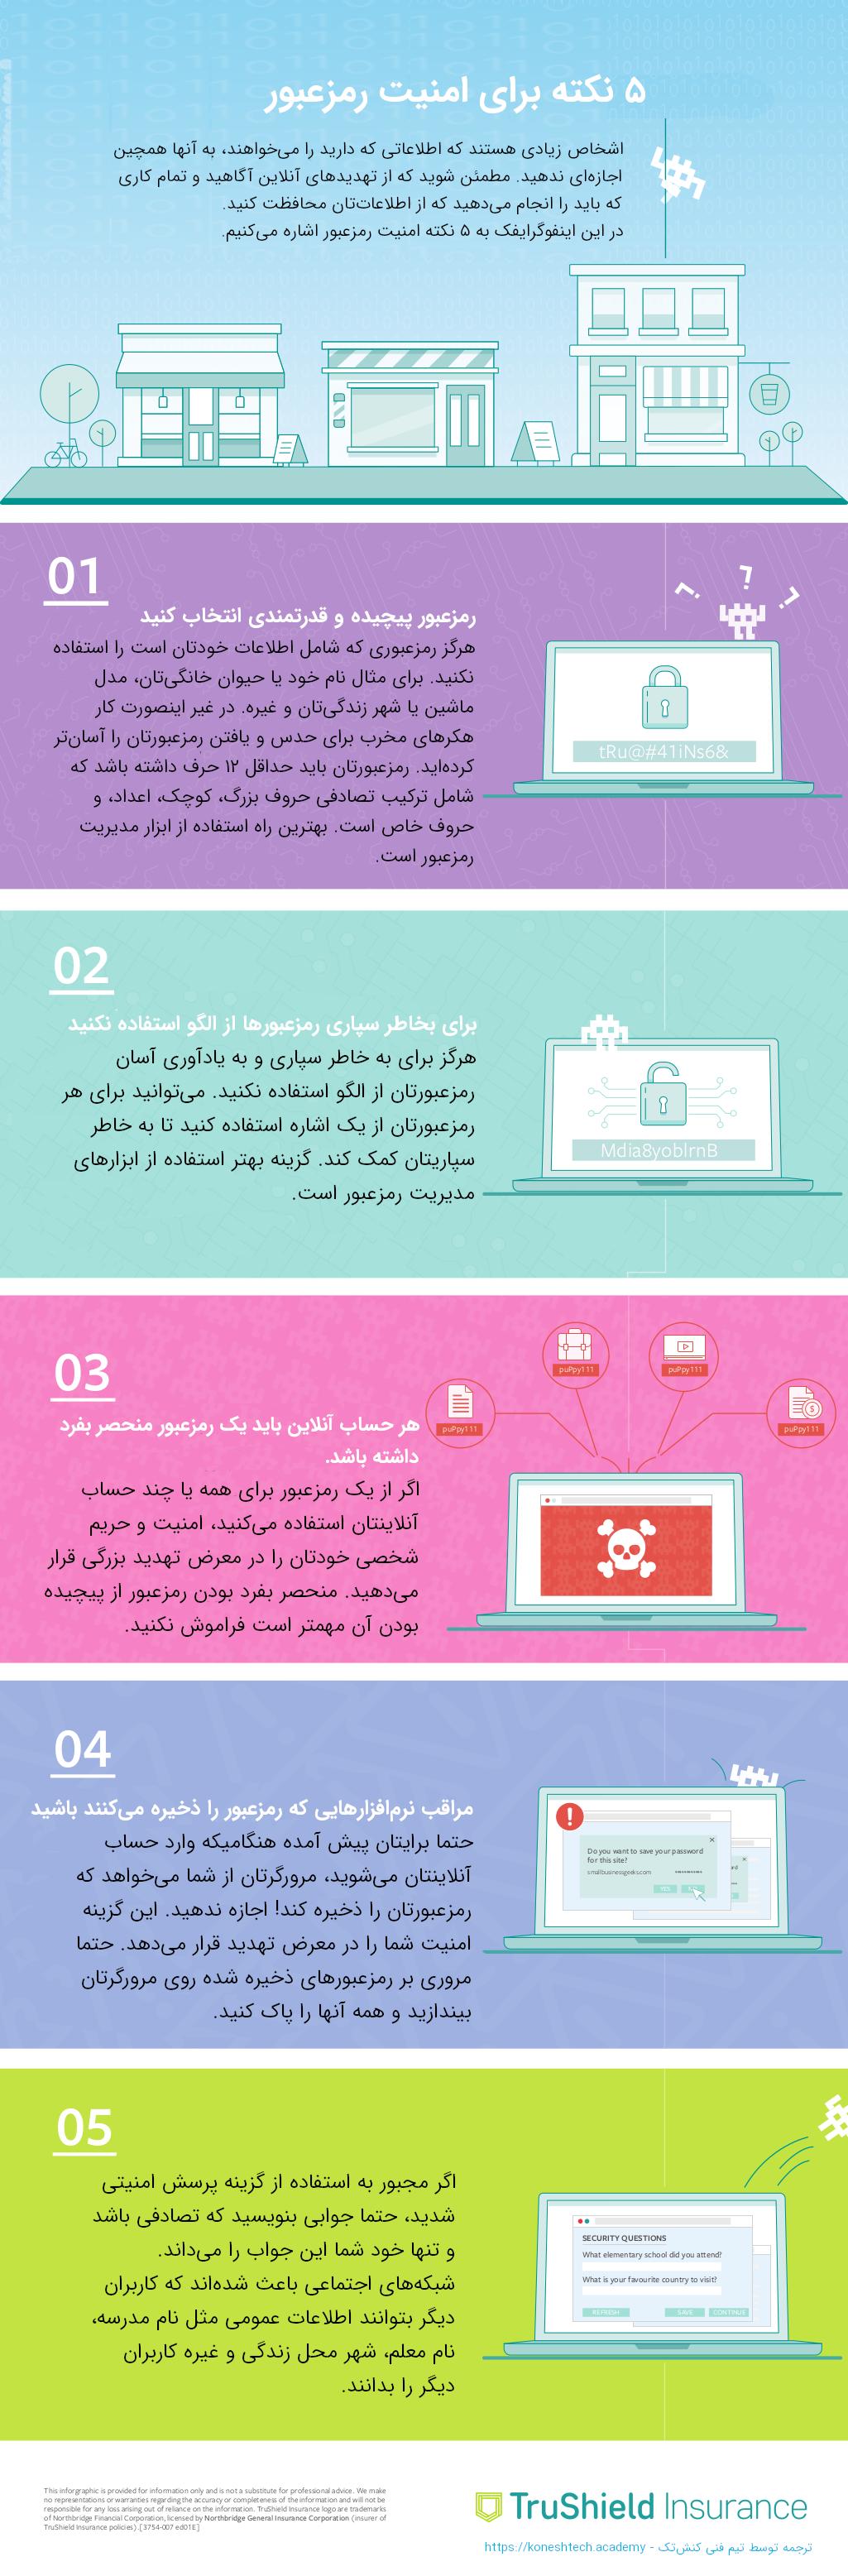 ۵ نکته امنیتی رمزعبور